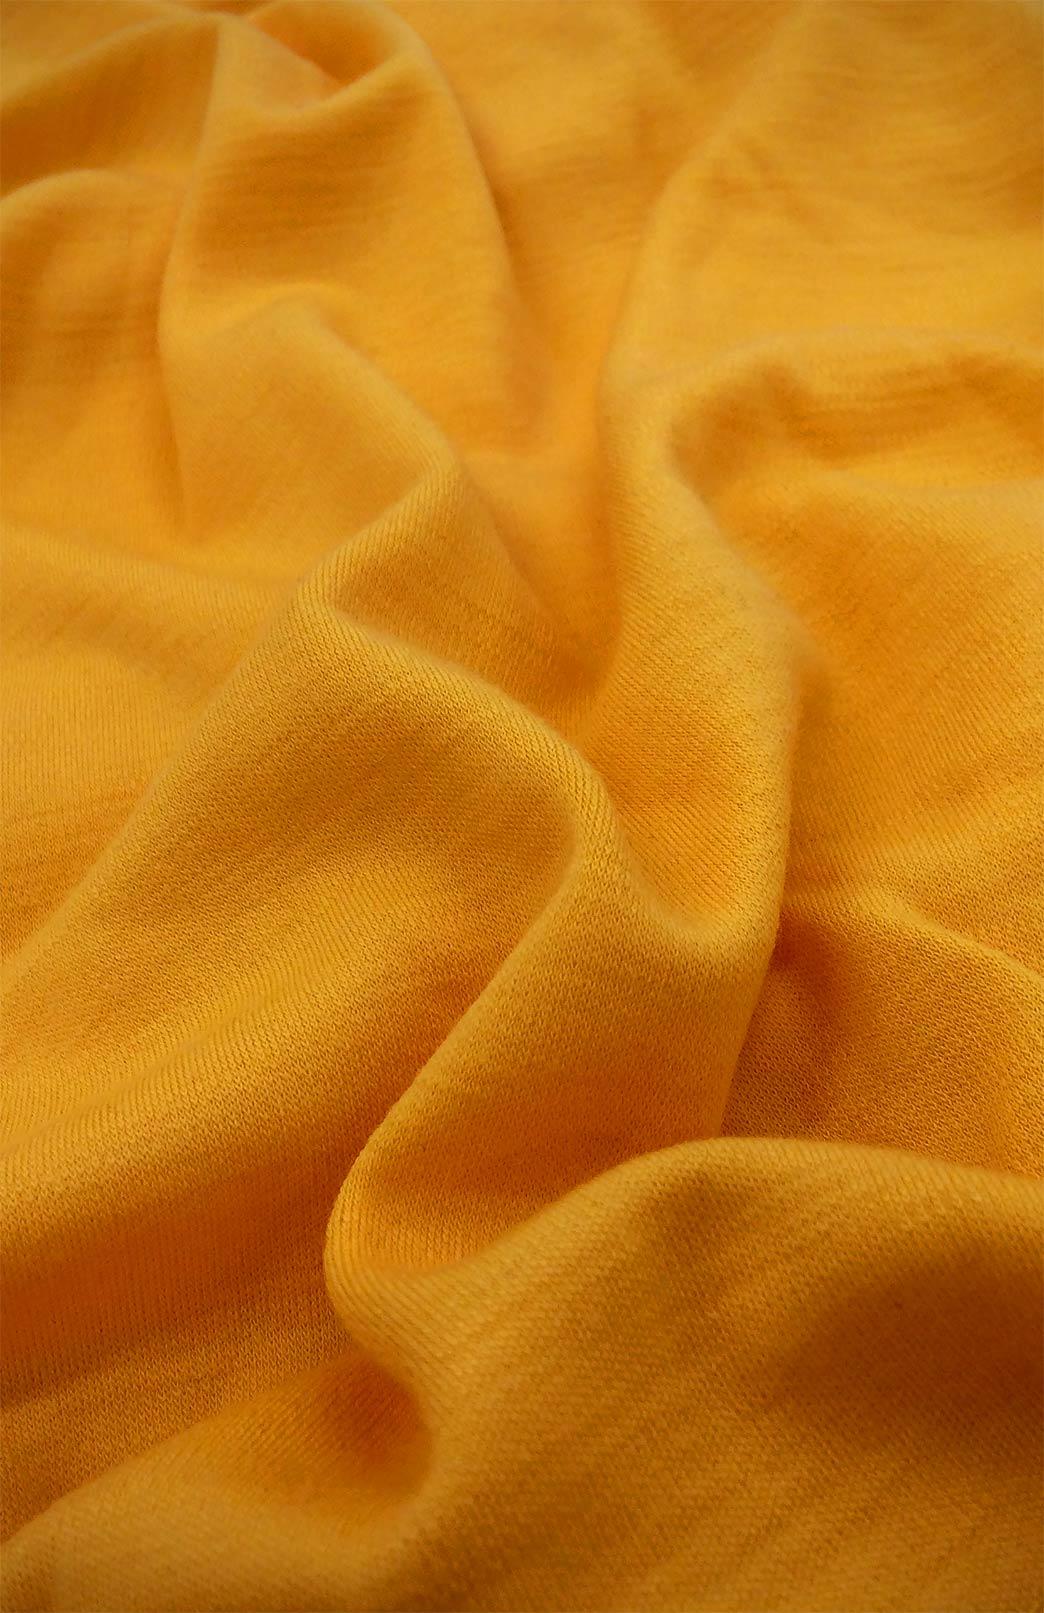 Holly Dress - Women's Yellow Merino Wool Sleeveless Shift Dress with Pockets - Smitten Merino Tasmania Australia